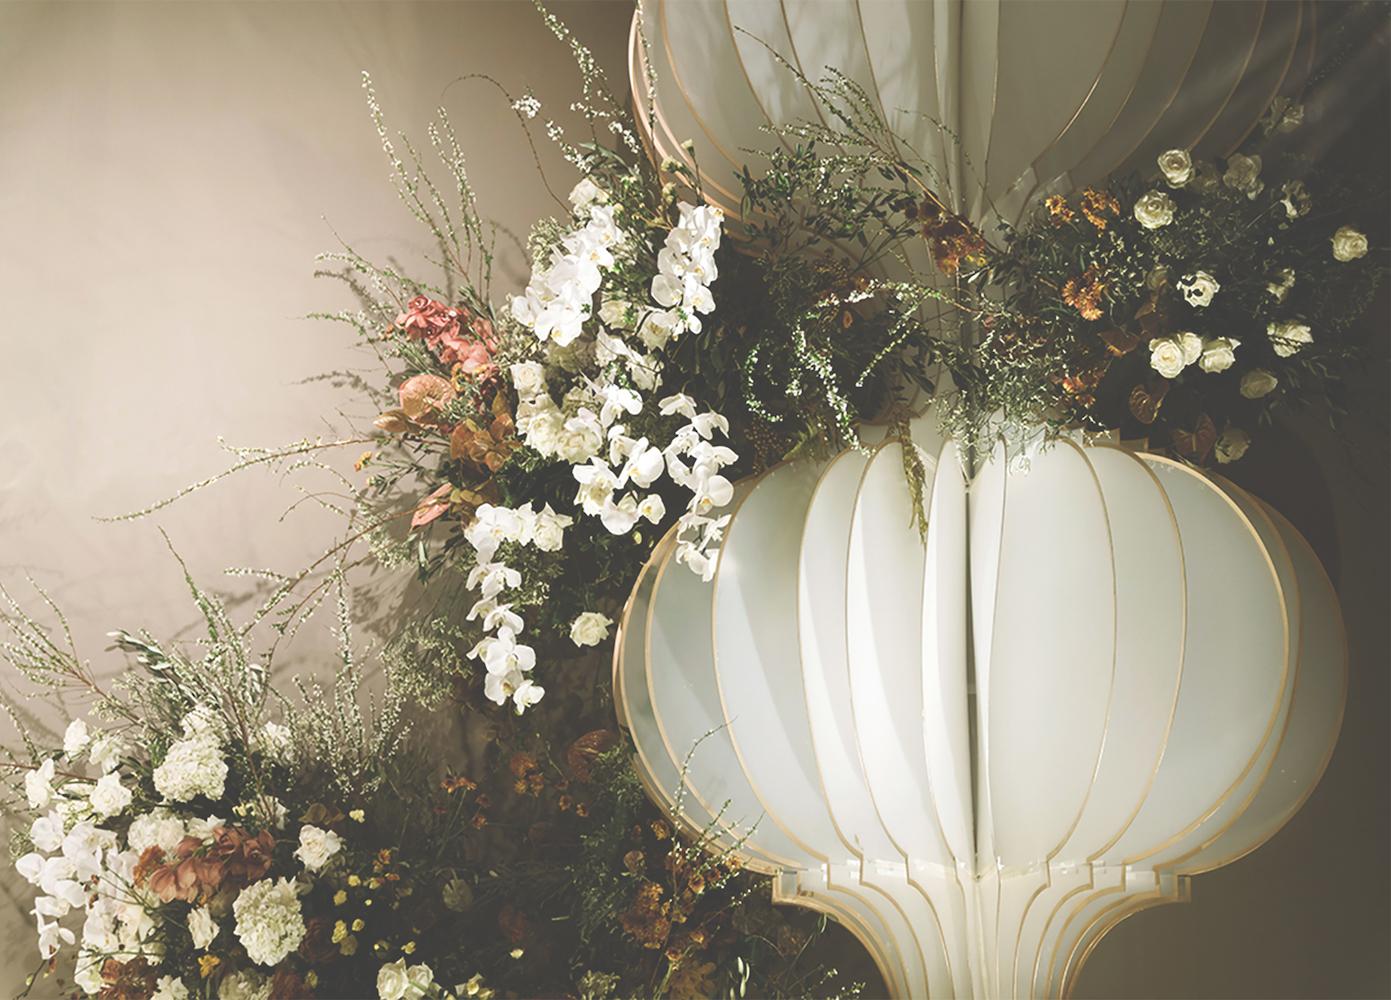 CAPELLA BANGKOK THE KNOT FLOWER POWER